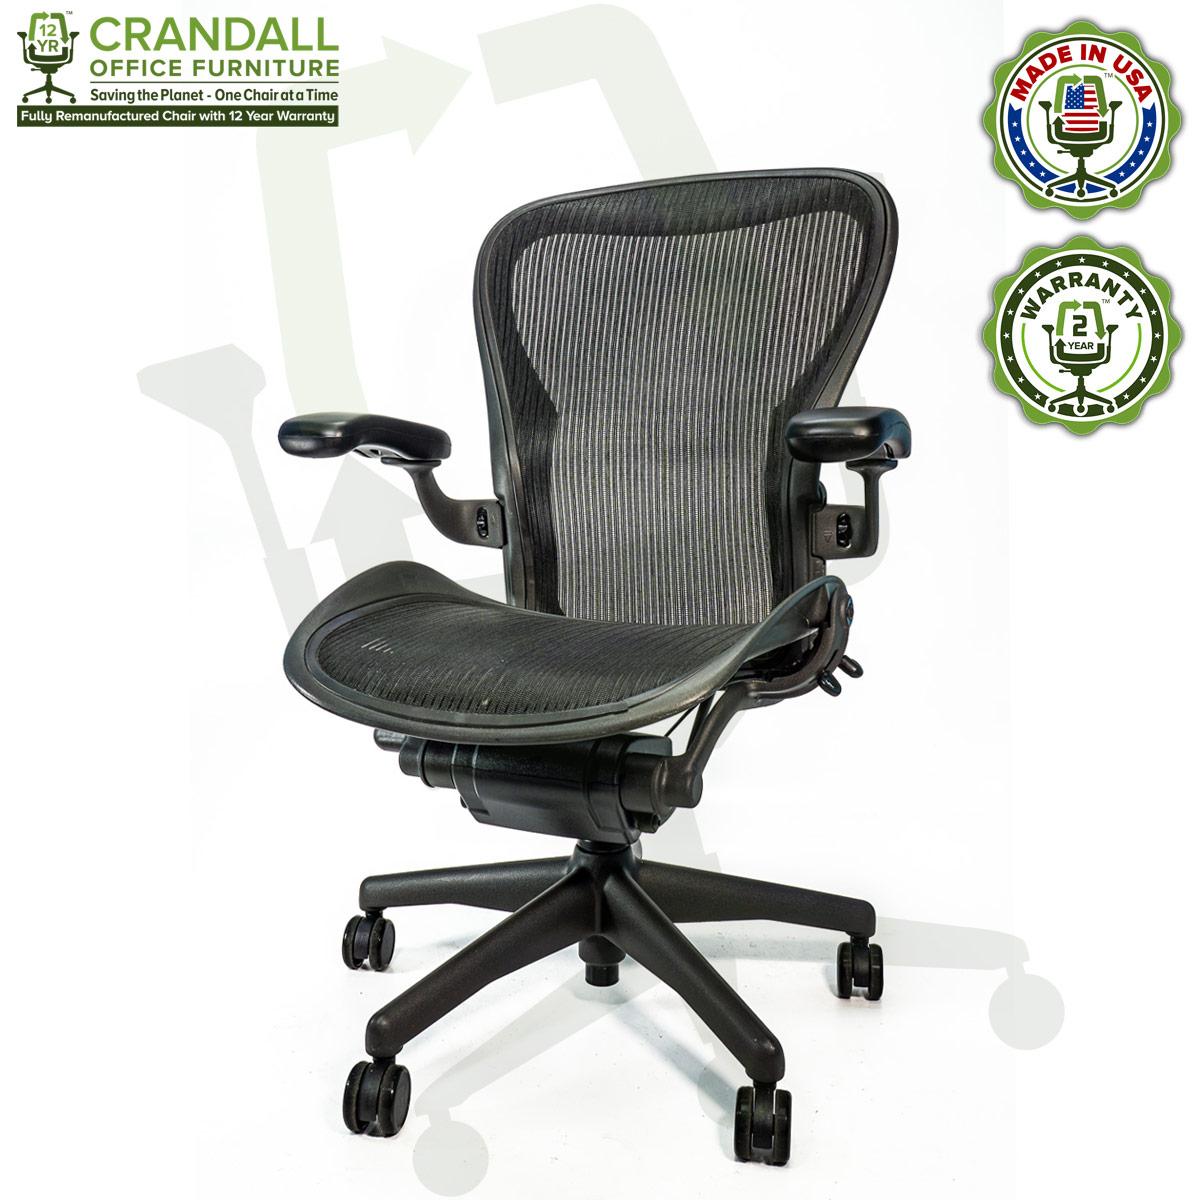 Crandall Office Refurbished Herman Miller Aeron Chair - Size C - 0002